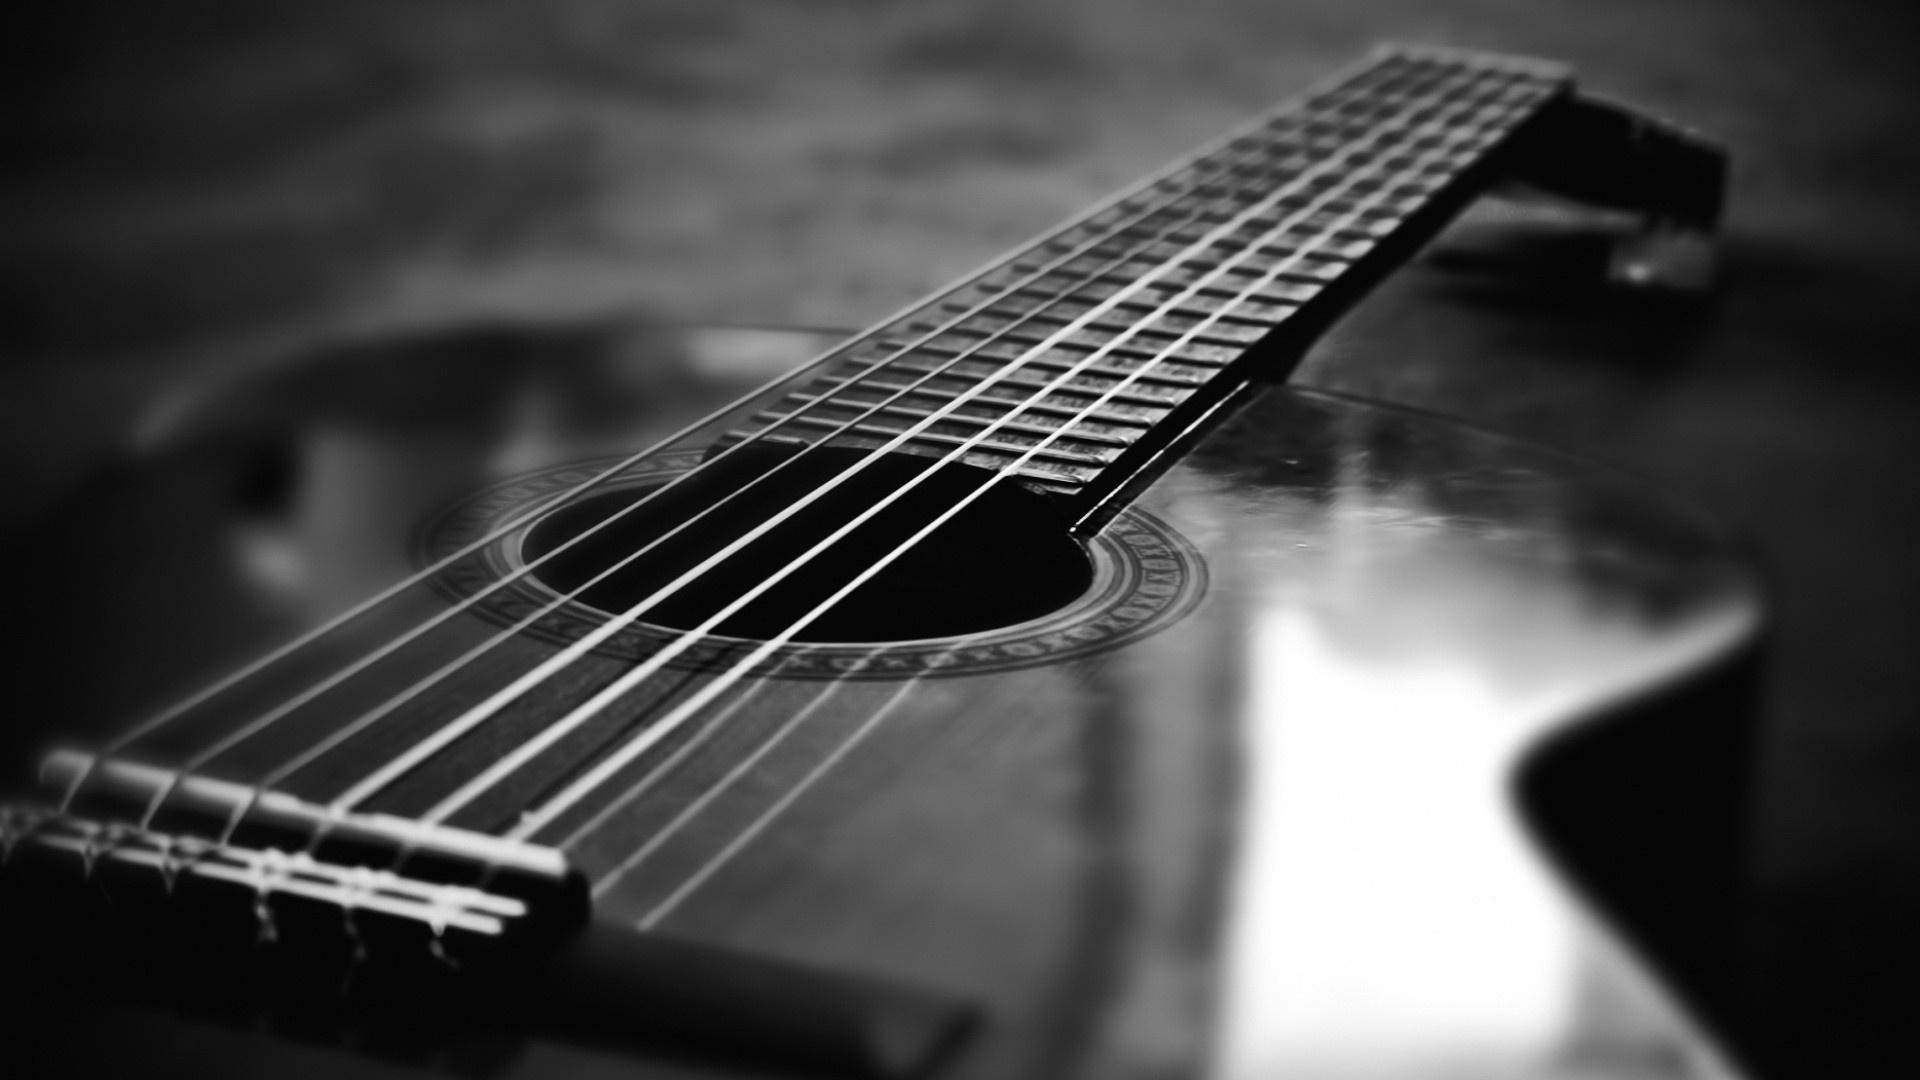 japanese guitar ibanez music macro photo wallpaper